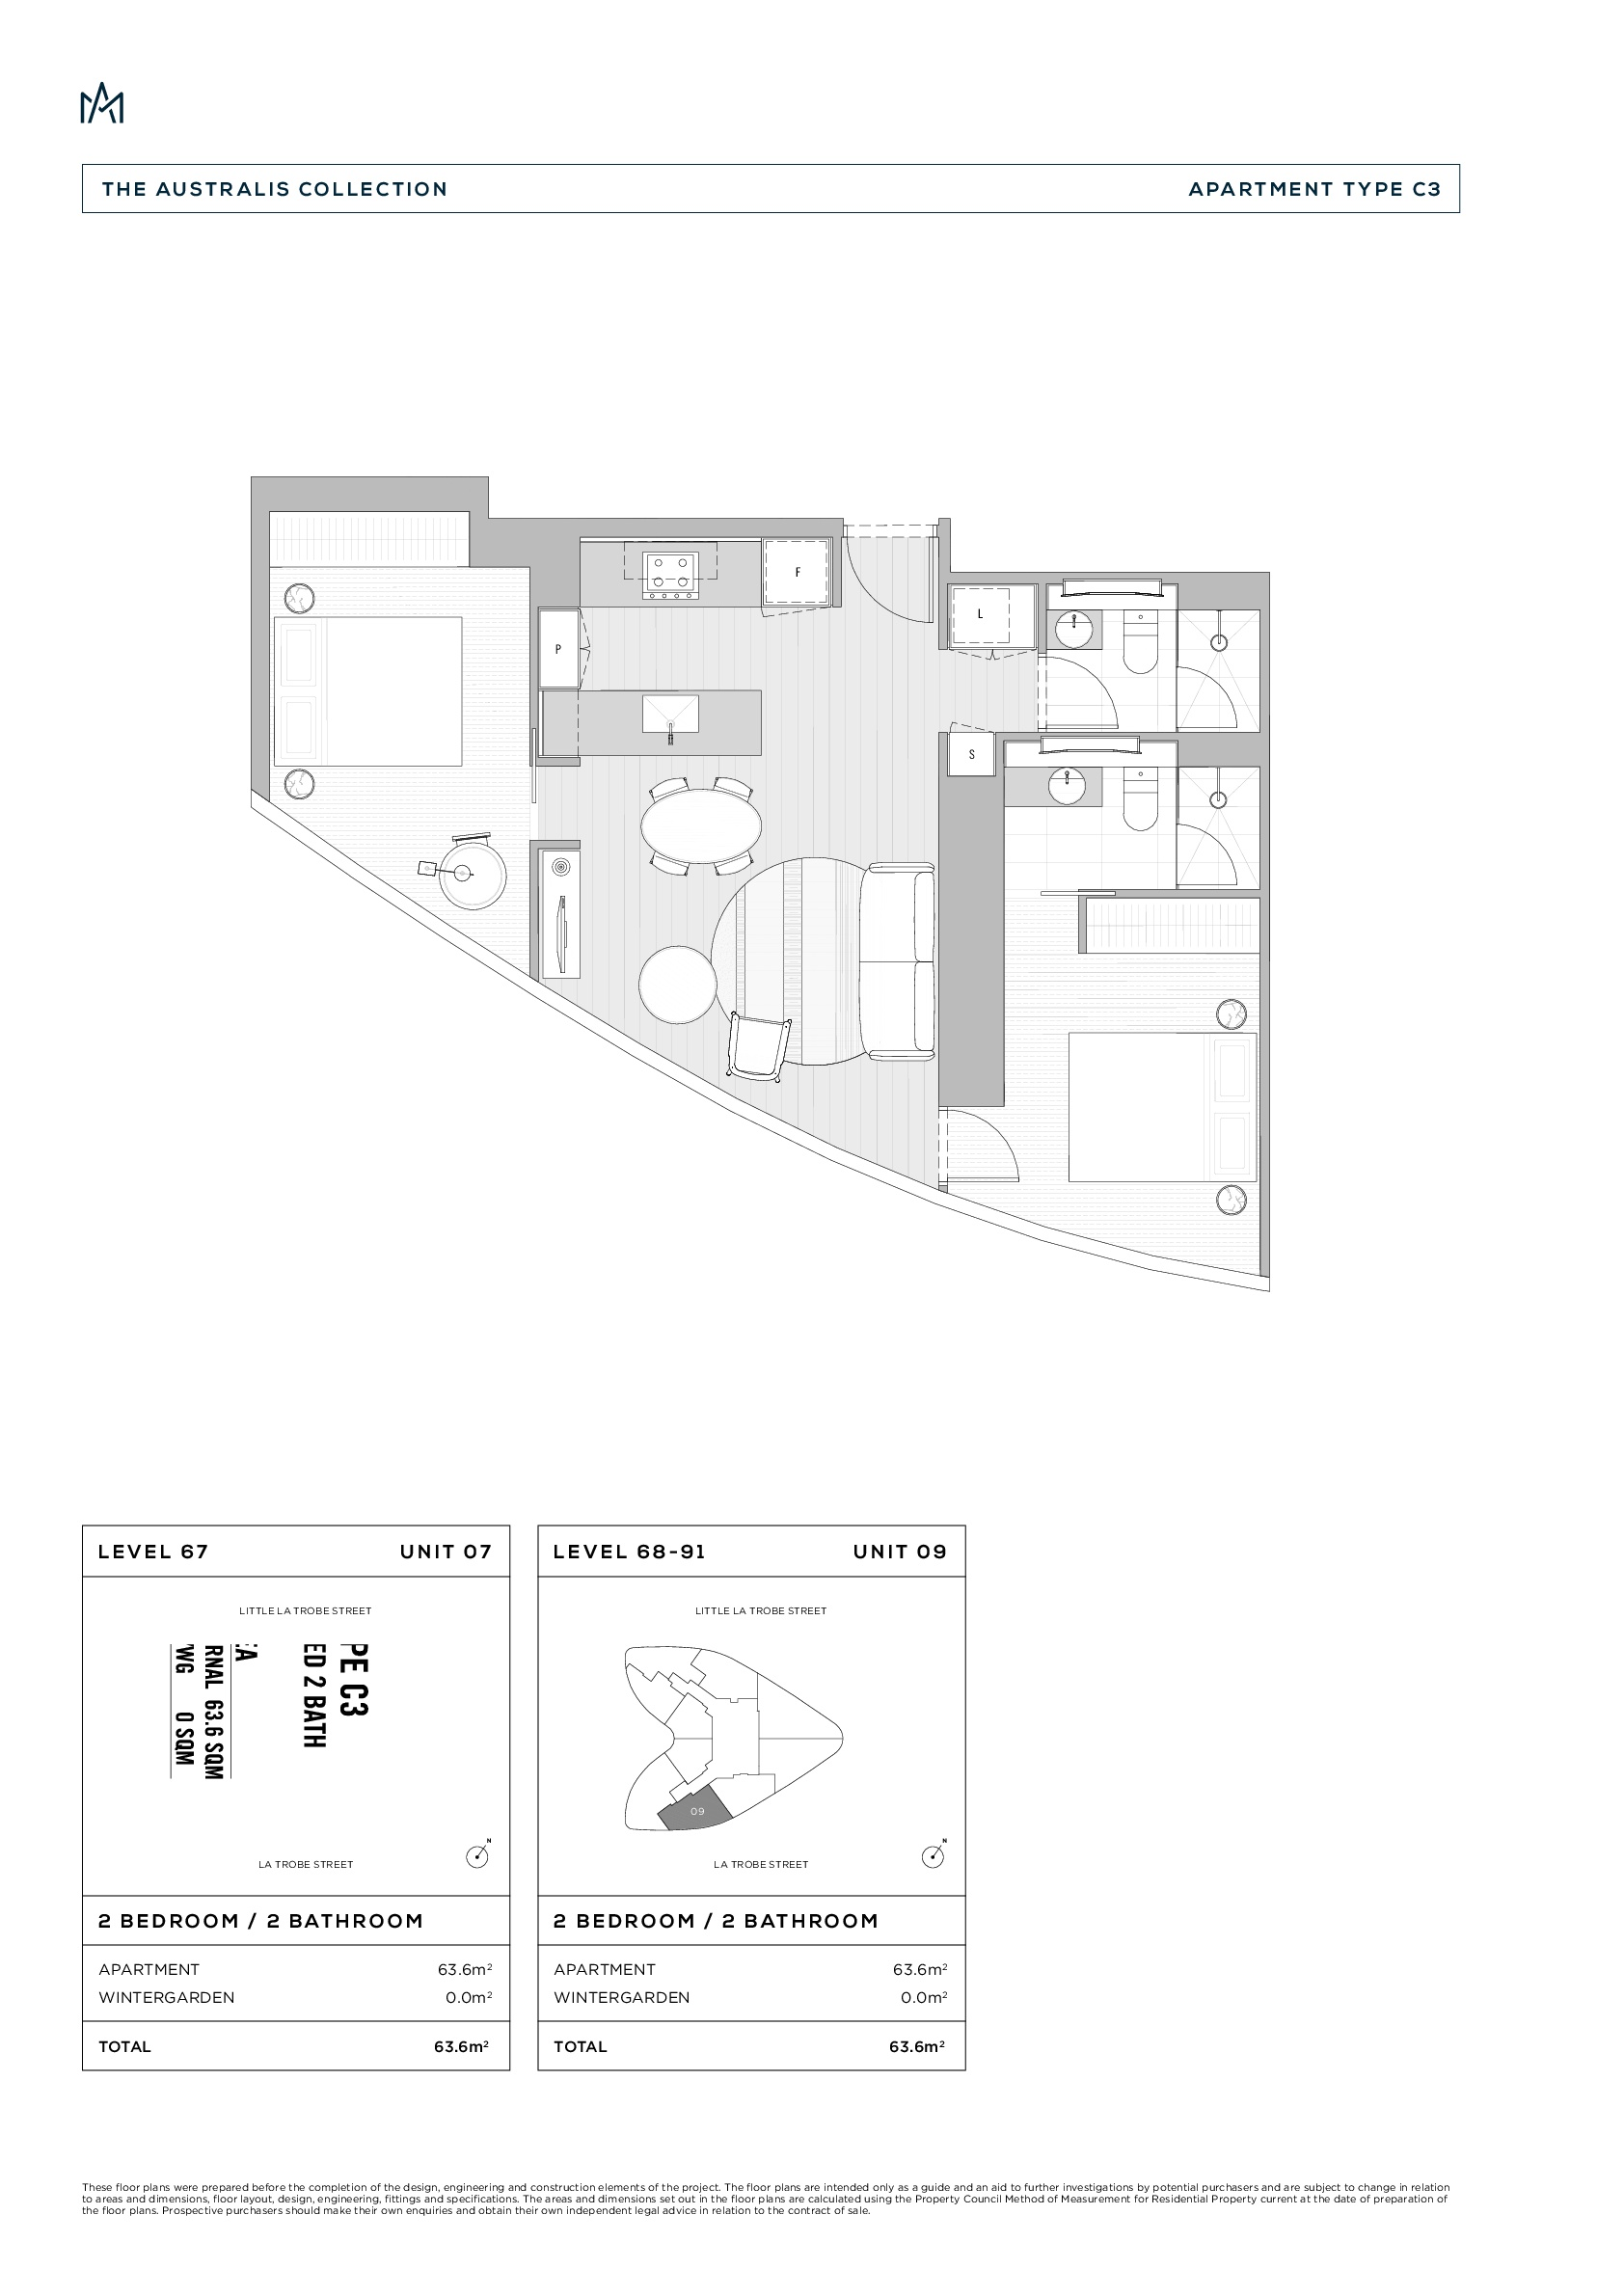 Ironfish Real Estate 7703 224 252 La Trobe Street Melbourne Vic 3000